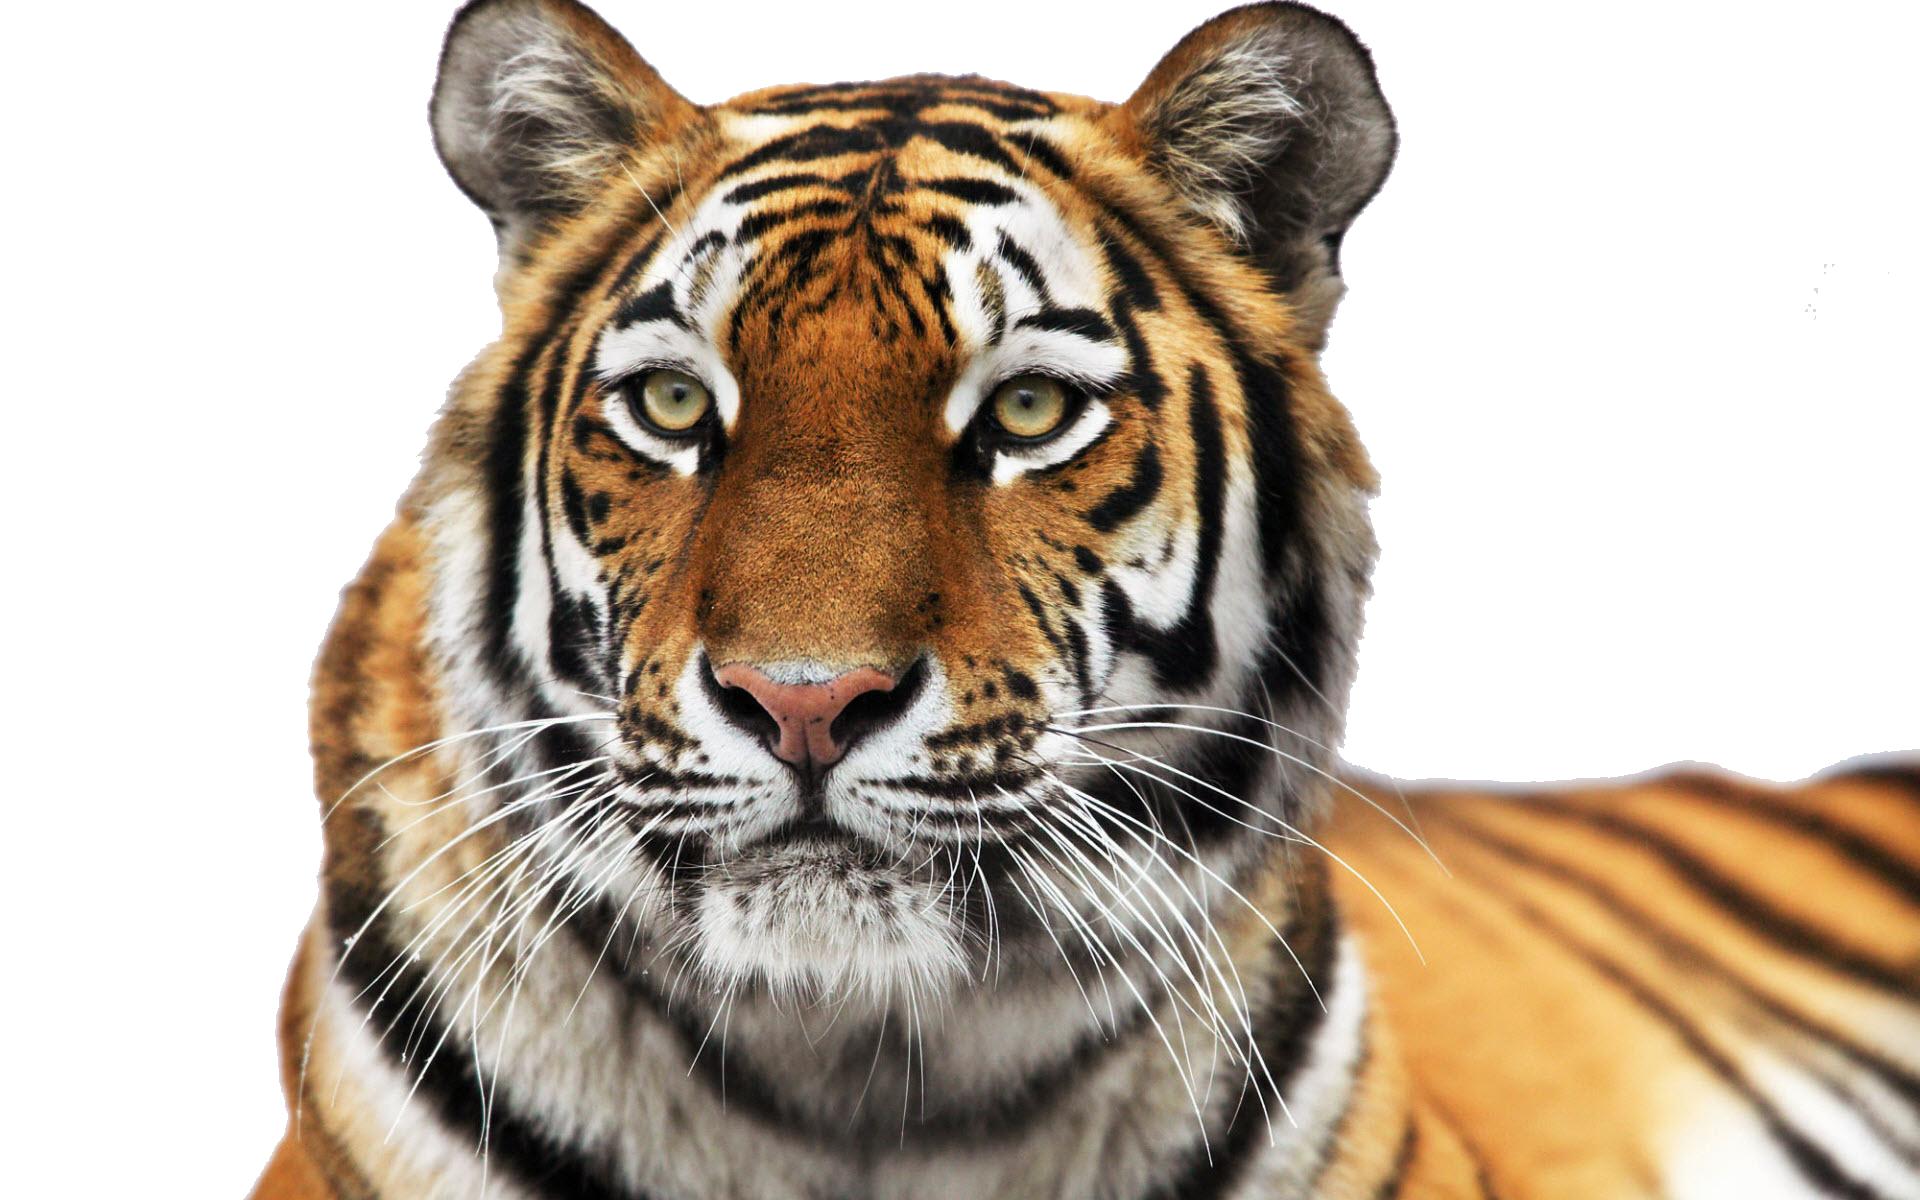 Png tiger face transparent. Scooby doo clipart psd